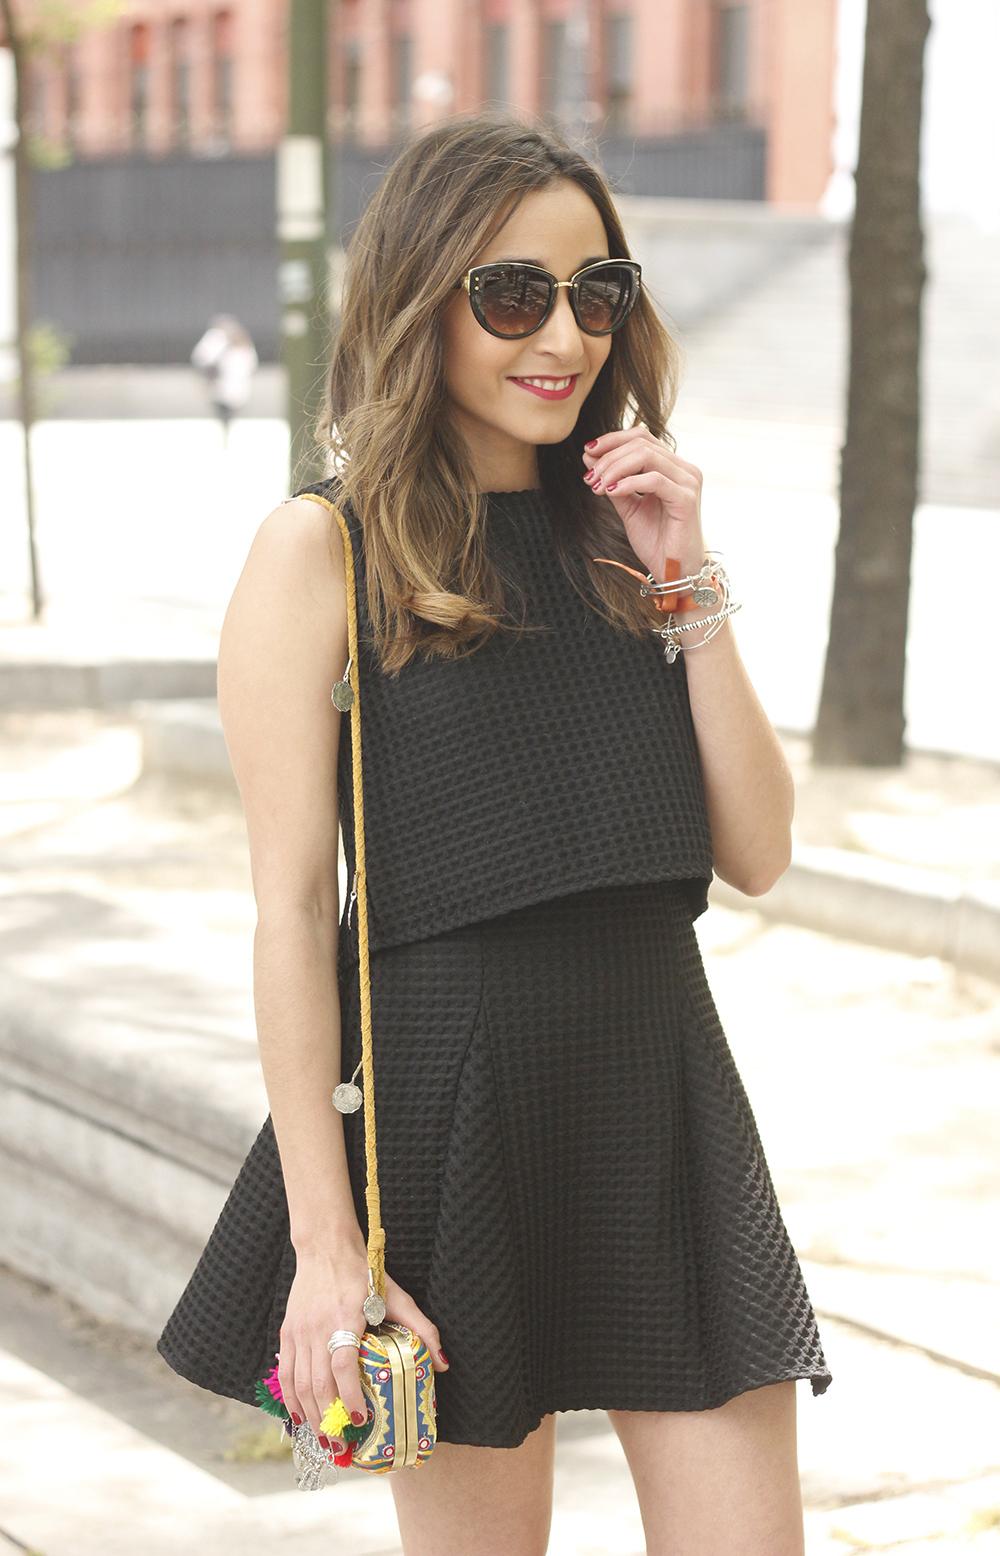 Little black dress maje carolina herrera sandals bag outfit fashion style summer sunnies18